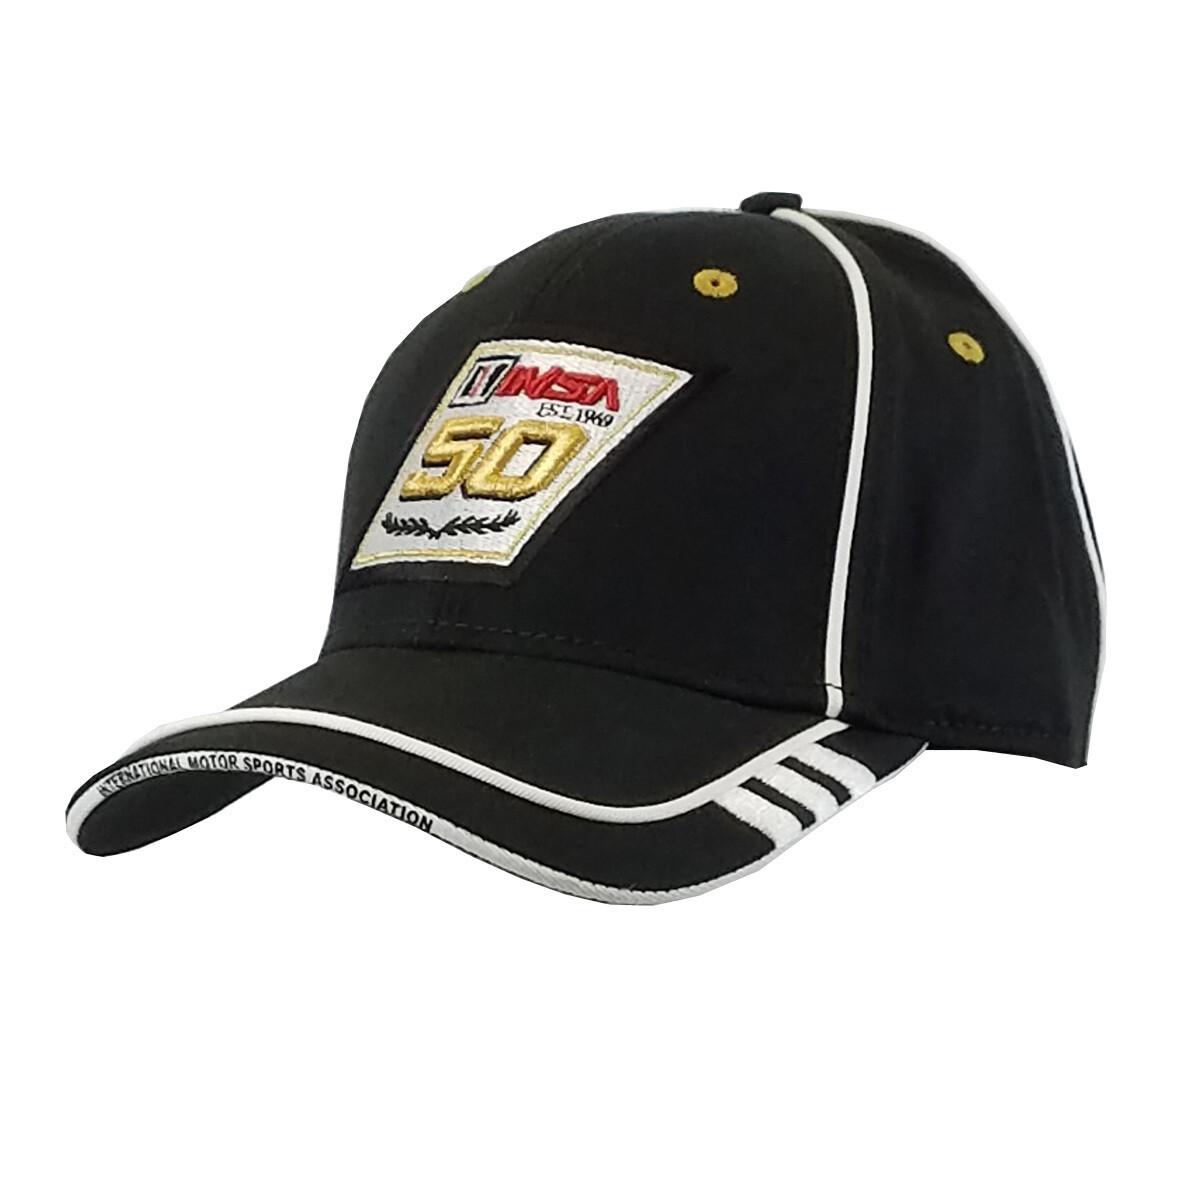 IMSA 50th Anniversary Blk Hat/Wh Piping